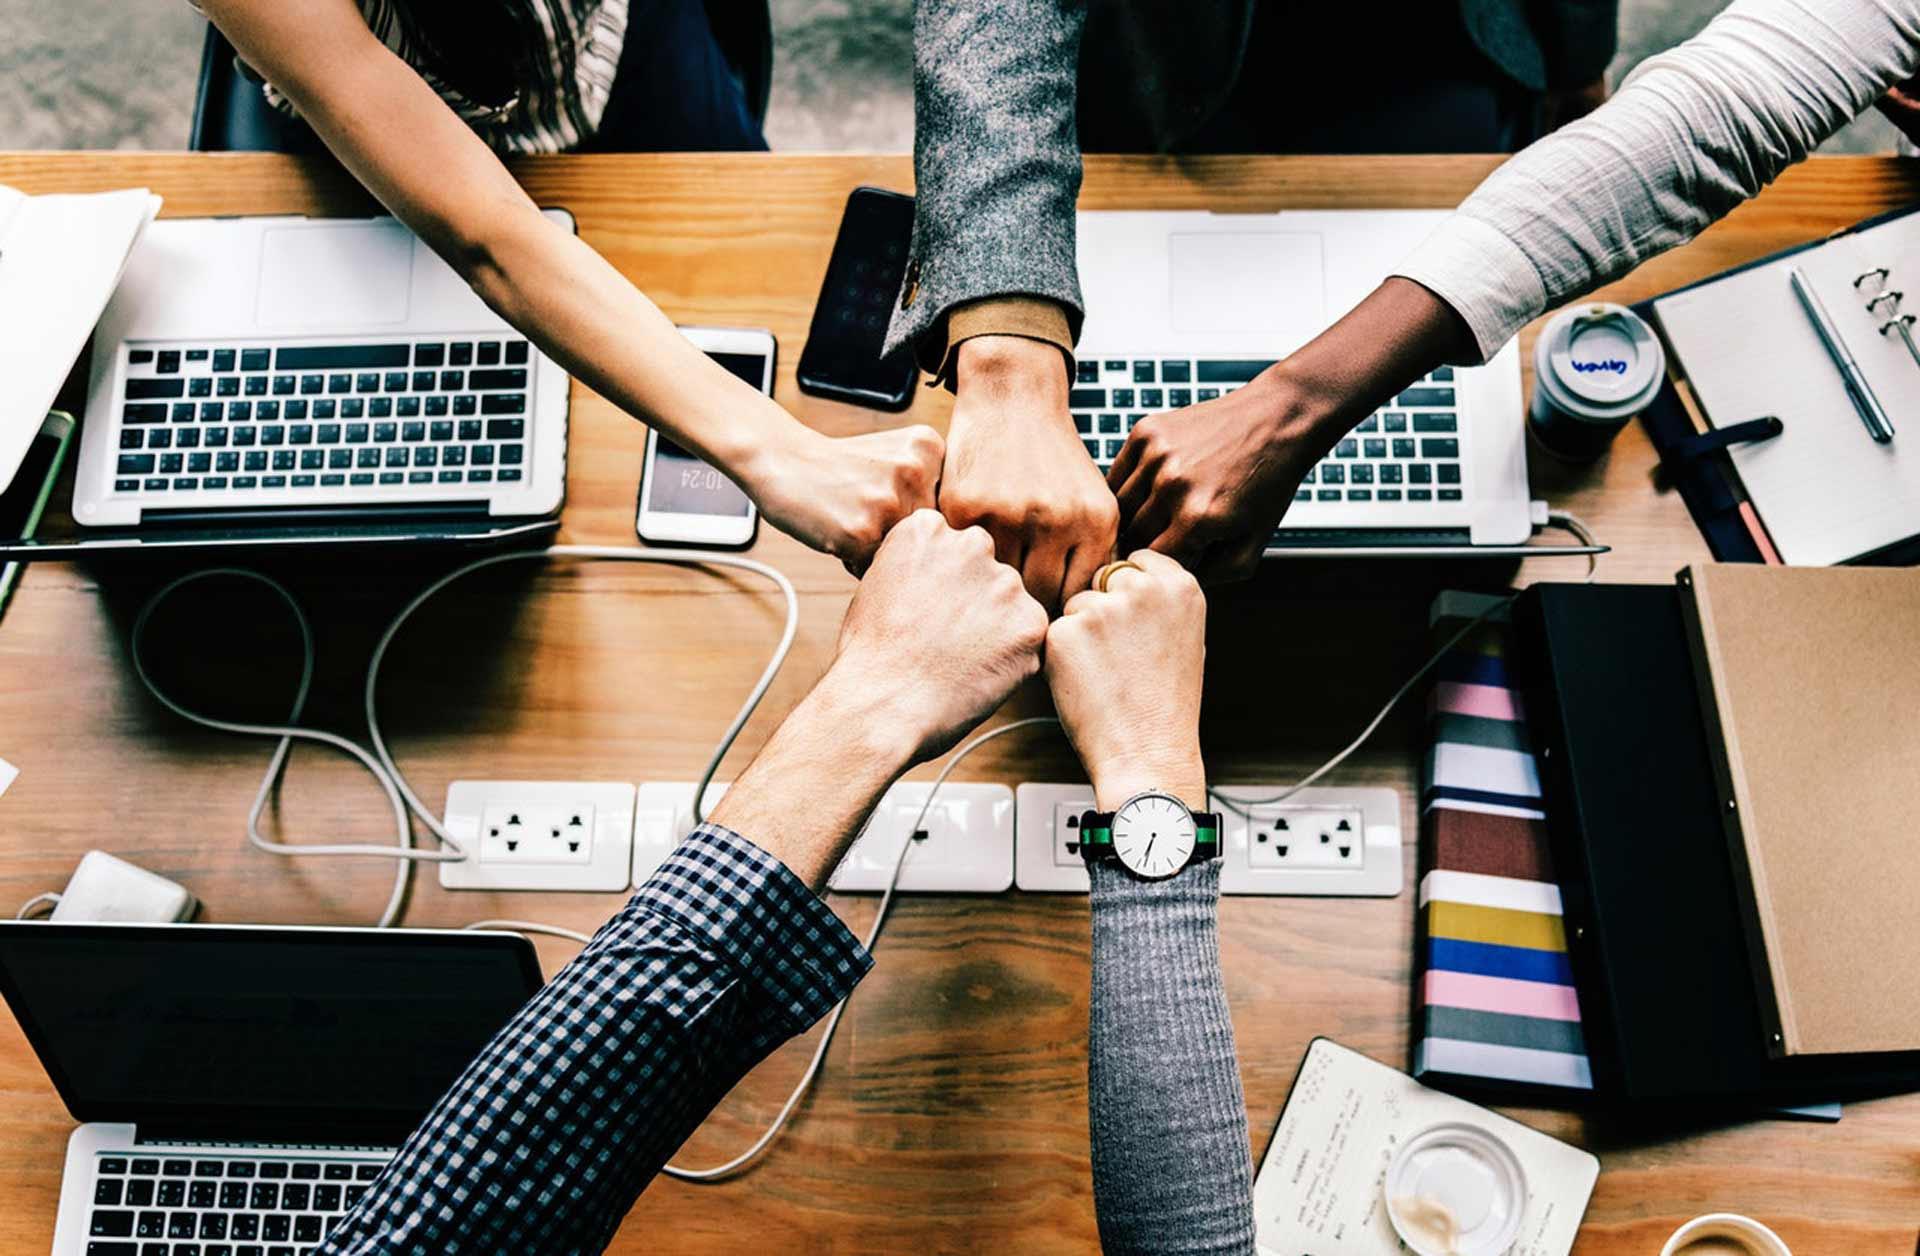 Advantages of Team Building Activities